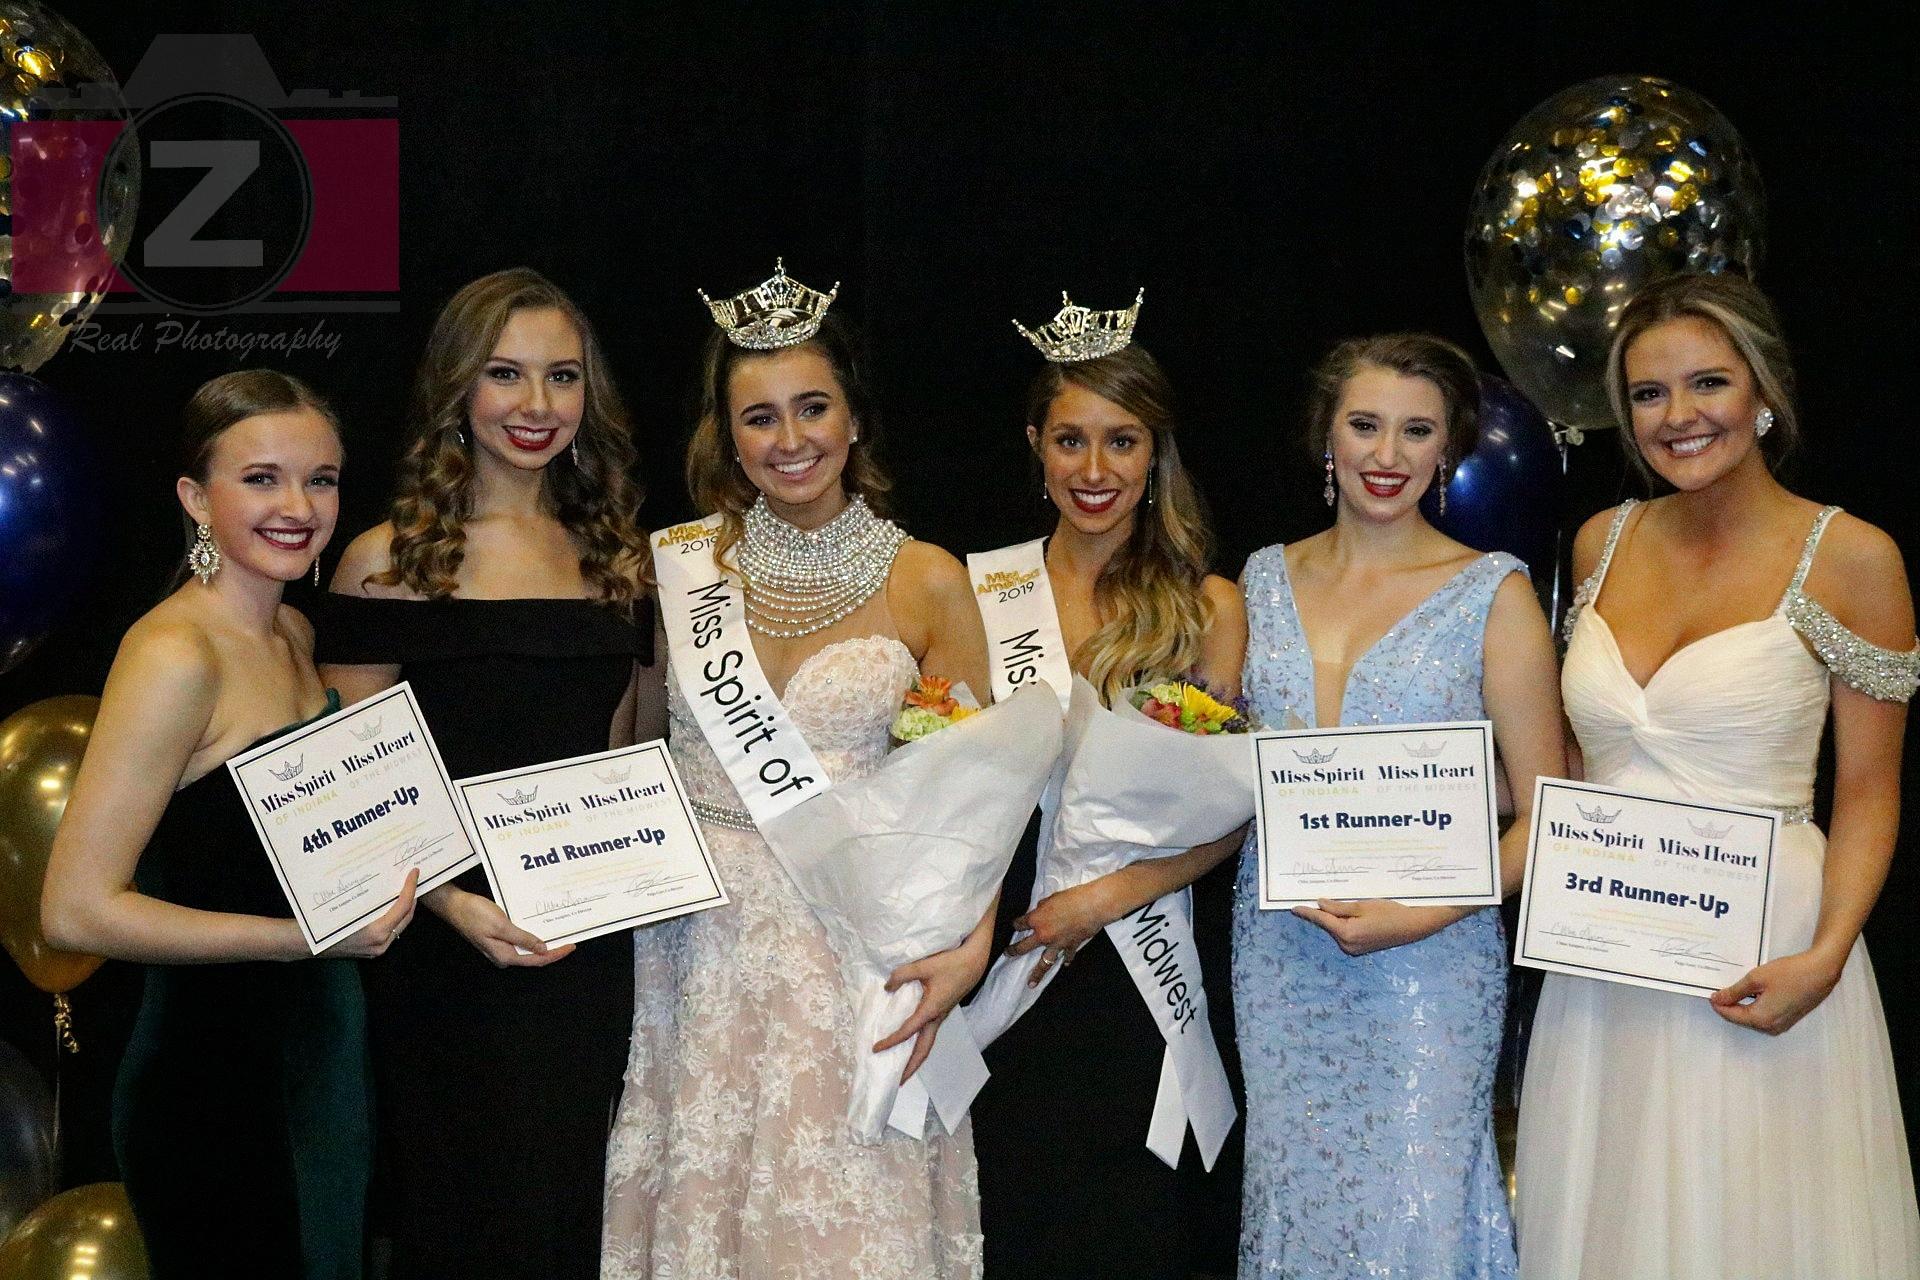 (Left-Right): Lindsey Brown, Brittany Gallarneau, Alias Tschuor, Samara Norris, Priscilla Olson, Hannah Bullion